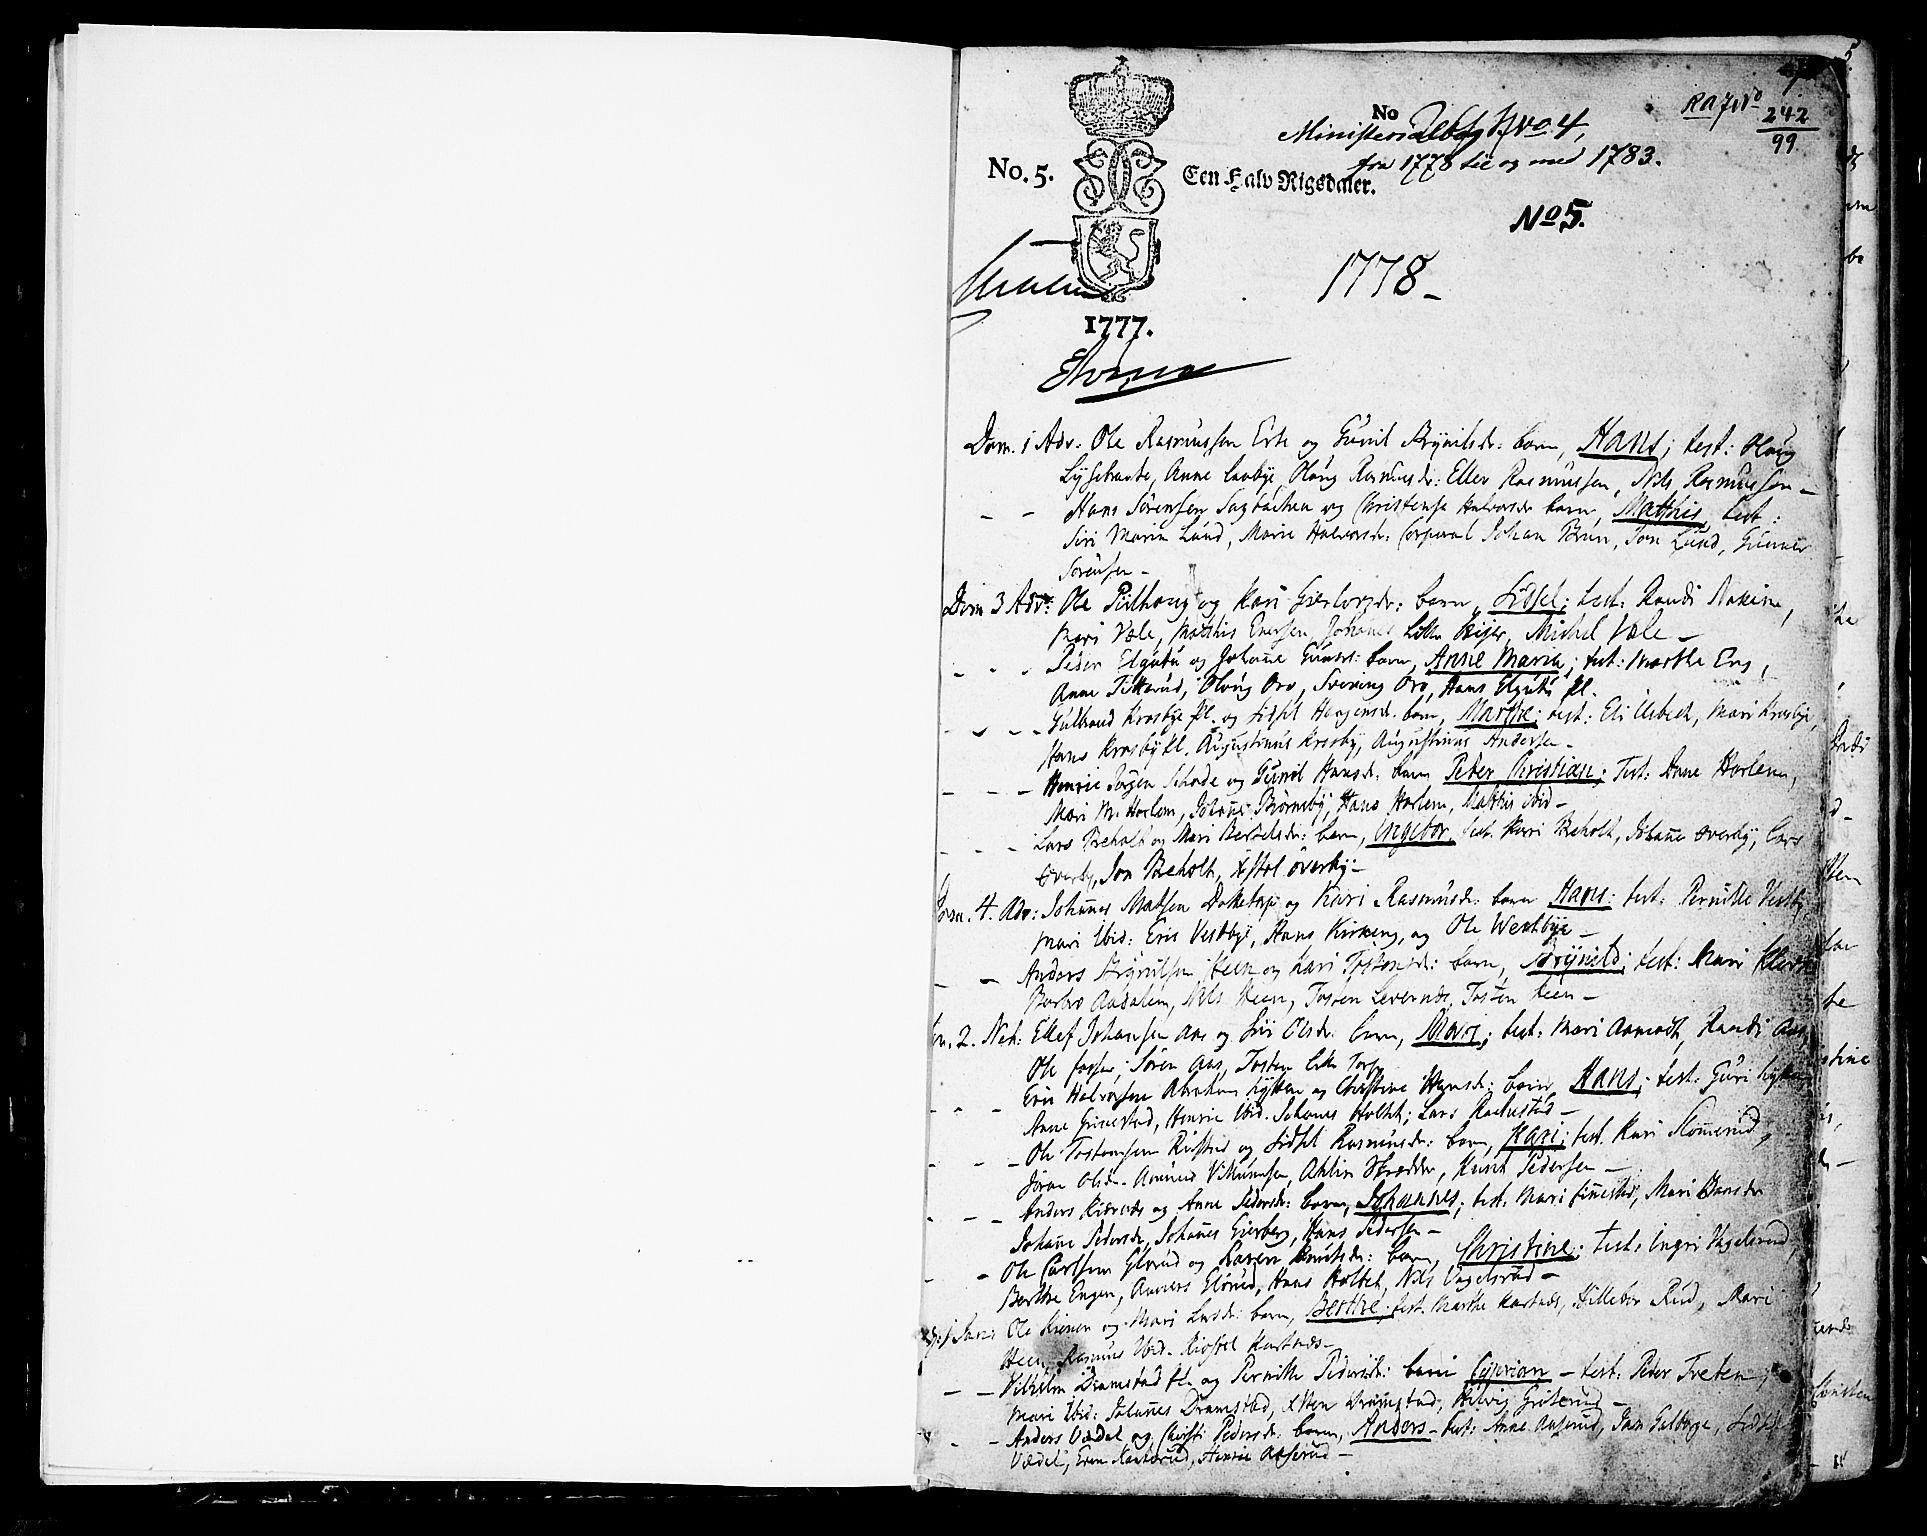 SAO, Rakkestad prestekontor Kirkebøker, F/Fa/L0004: Ministerialbok nr. I 4, 1777-1783, s. 0-1